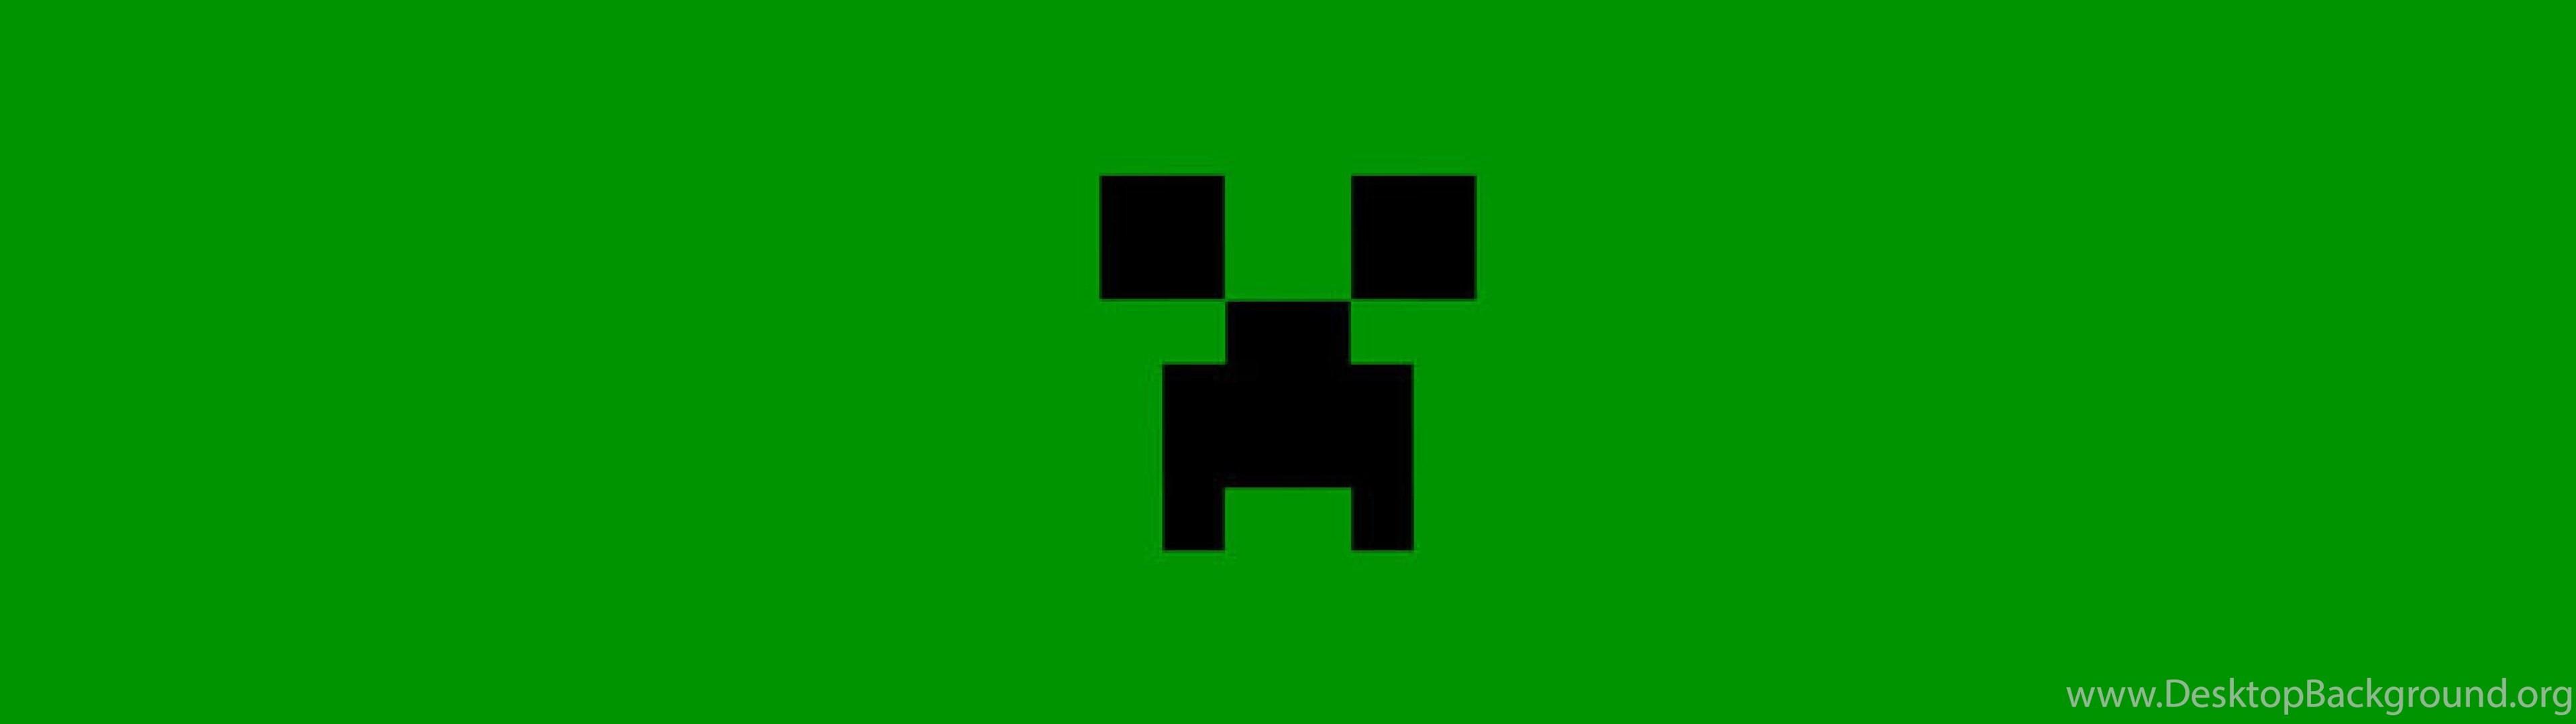 Minecraft creeper desktop background 79 pictures - Creeper iphone background ...